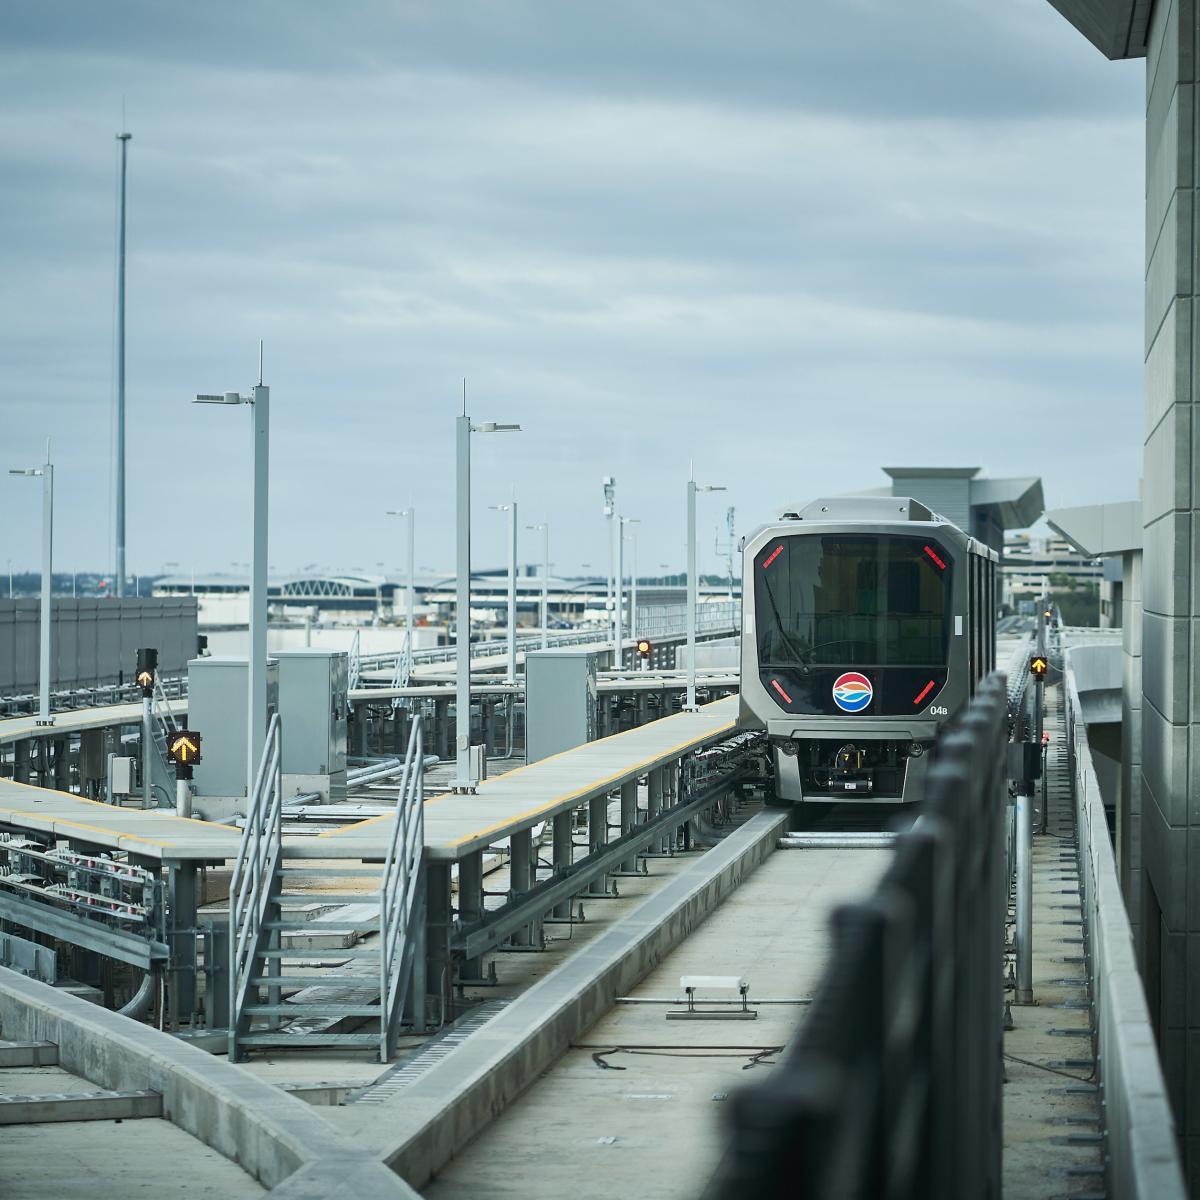 Tampa International Airport Shuttle